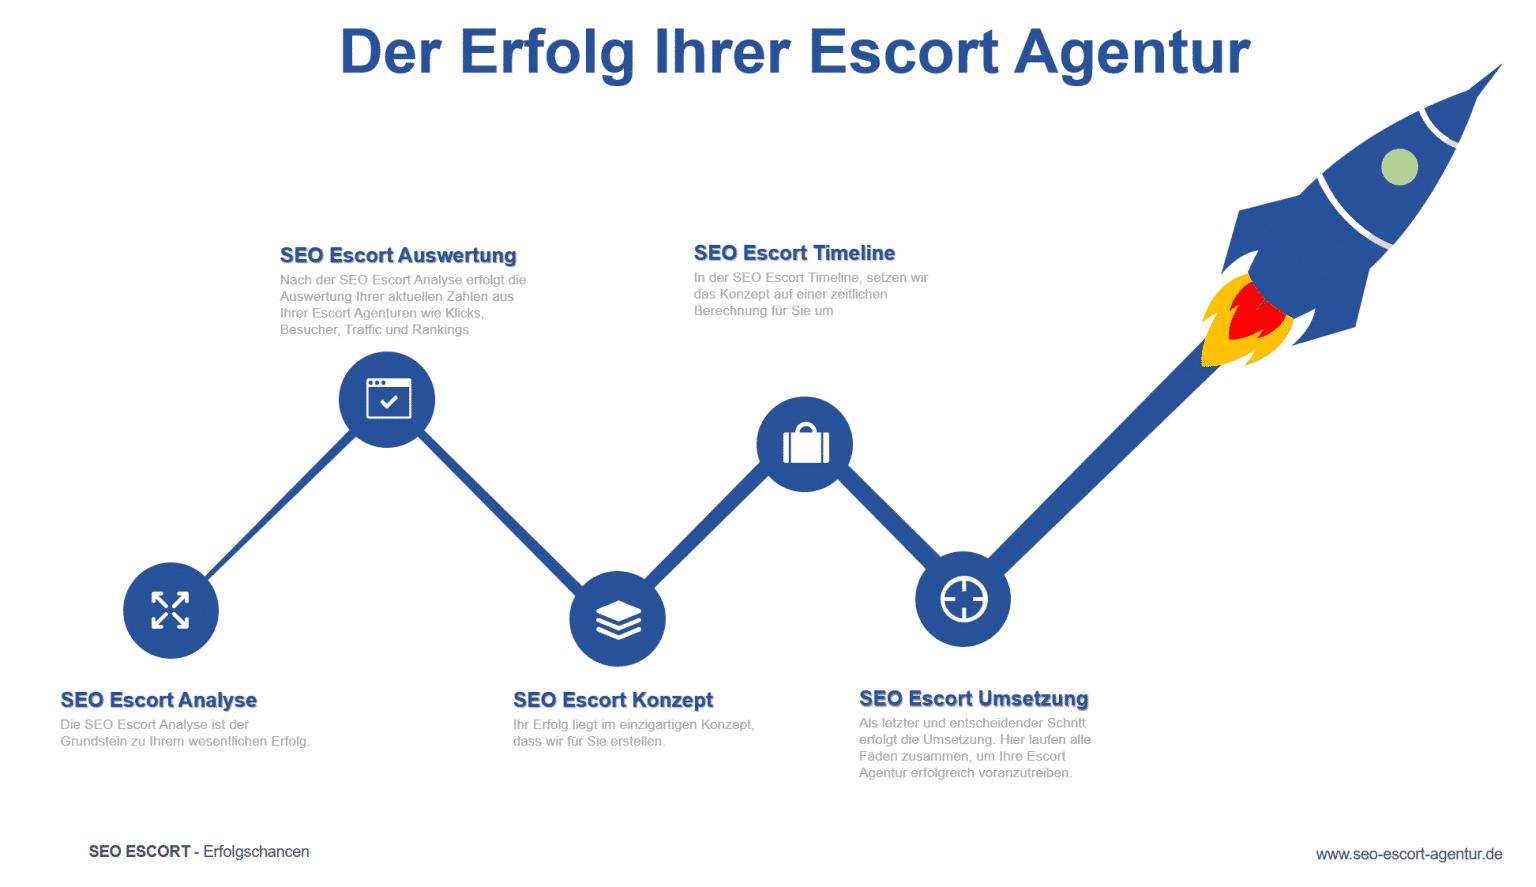 SEO Erfolgsgarantie - SEO Escort Agentur